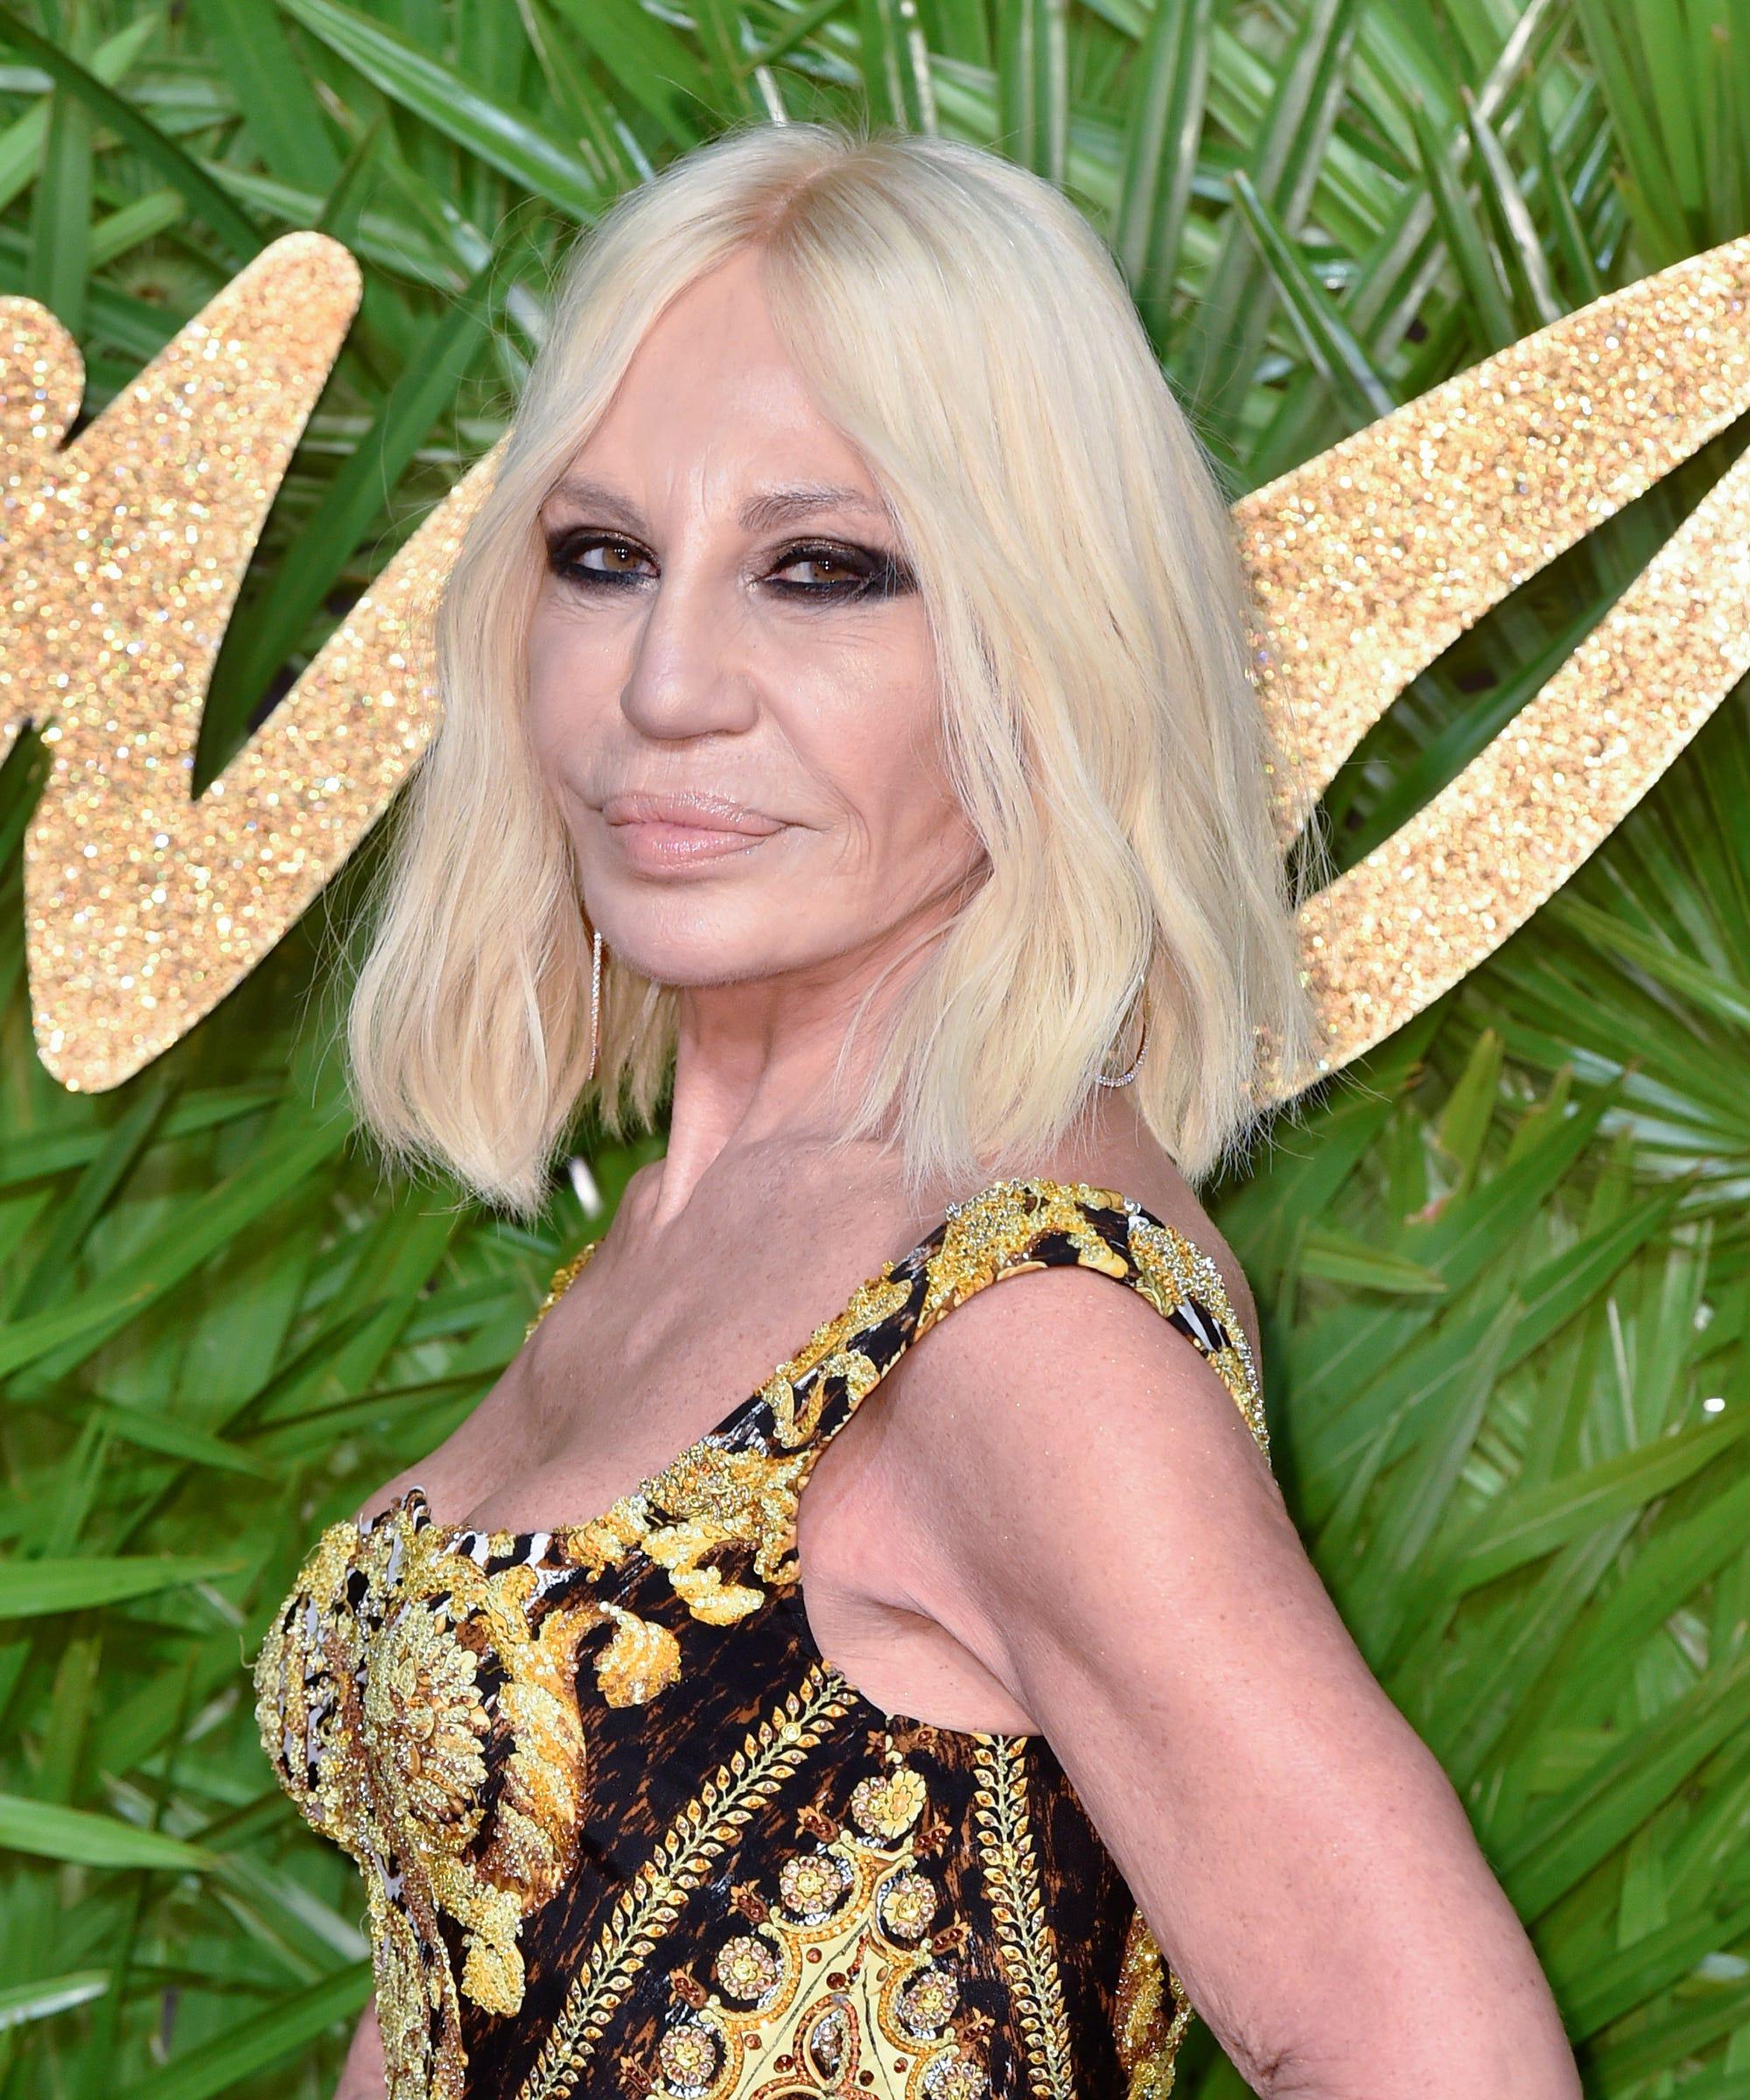 Donatella Versace considers natural beauty 37